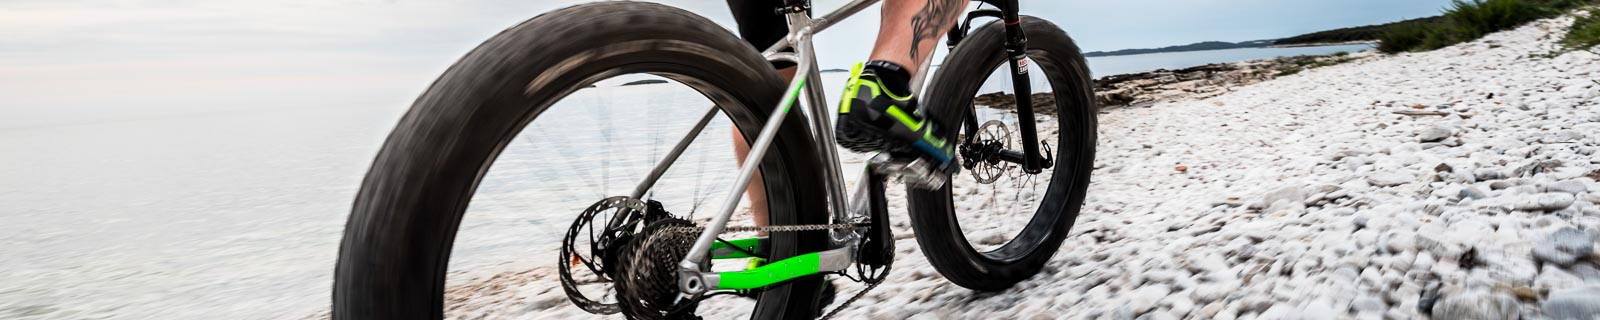 Fatbike Hardtail Mountainbikes